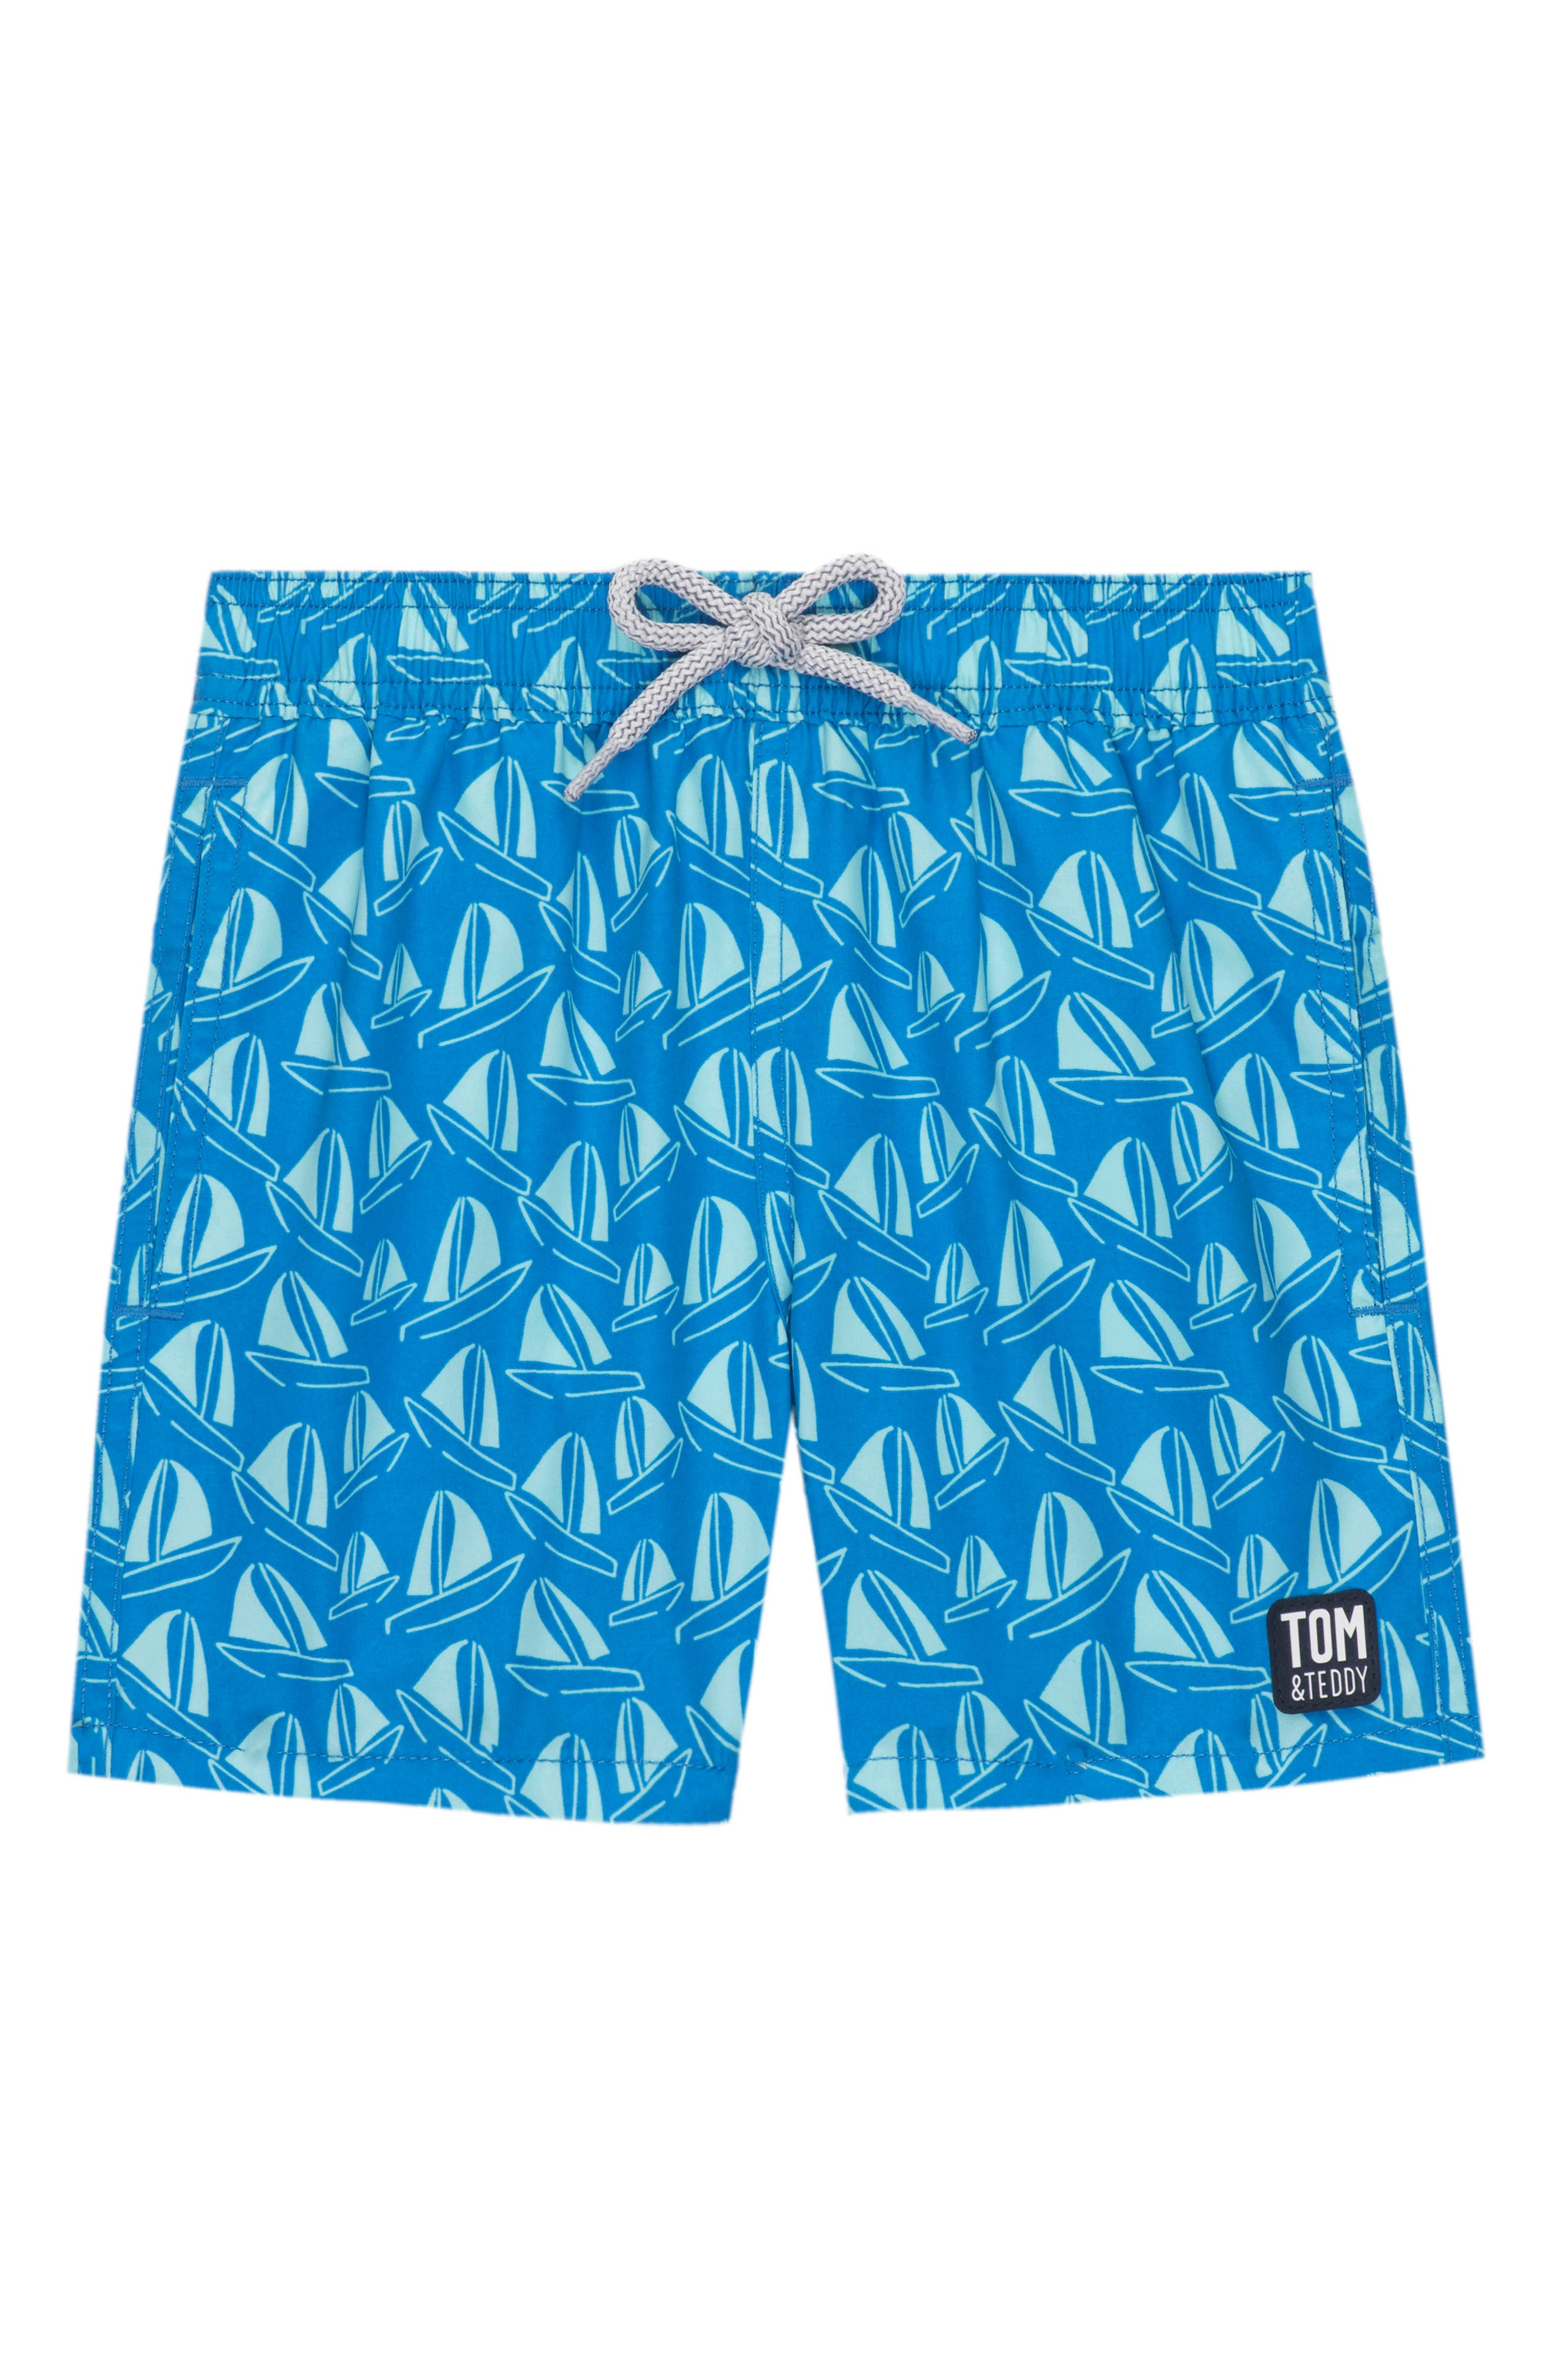 Boat Print Swim Trunks,                         Main,                         color, 420